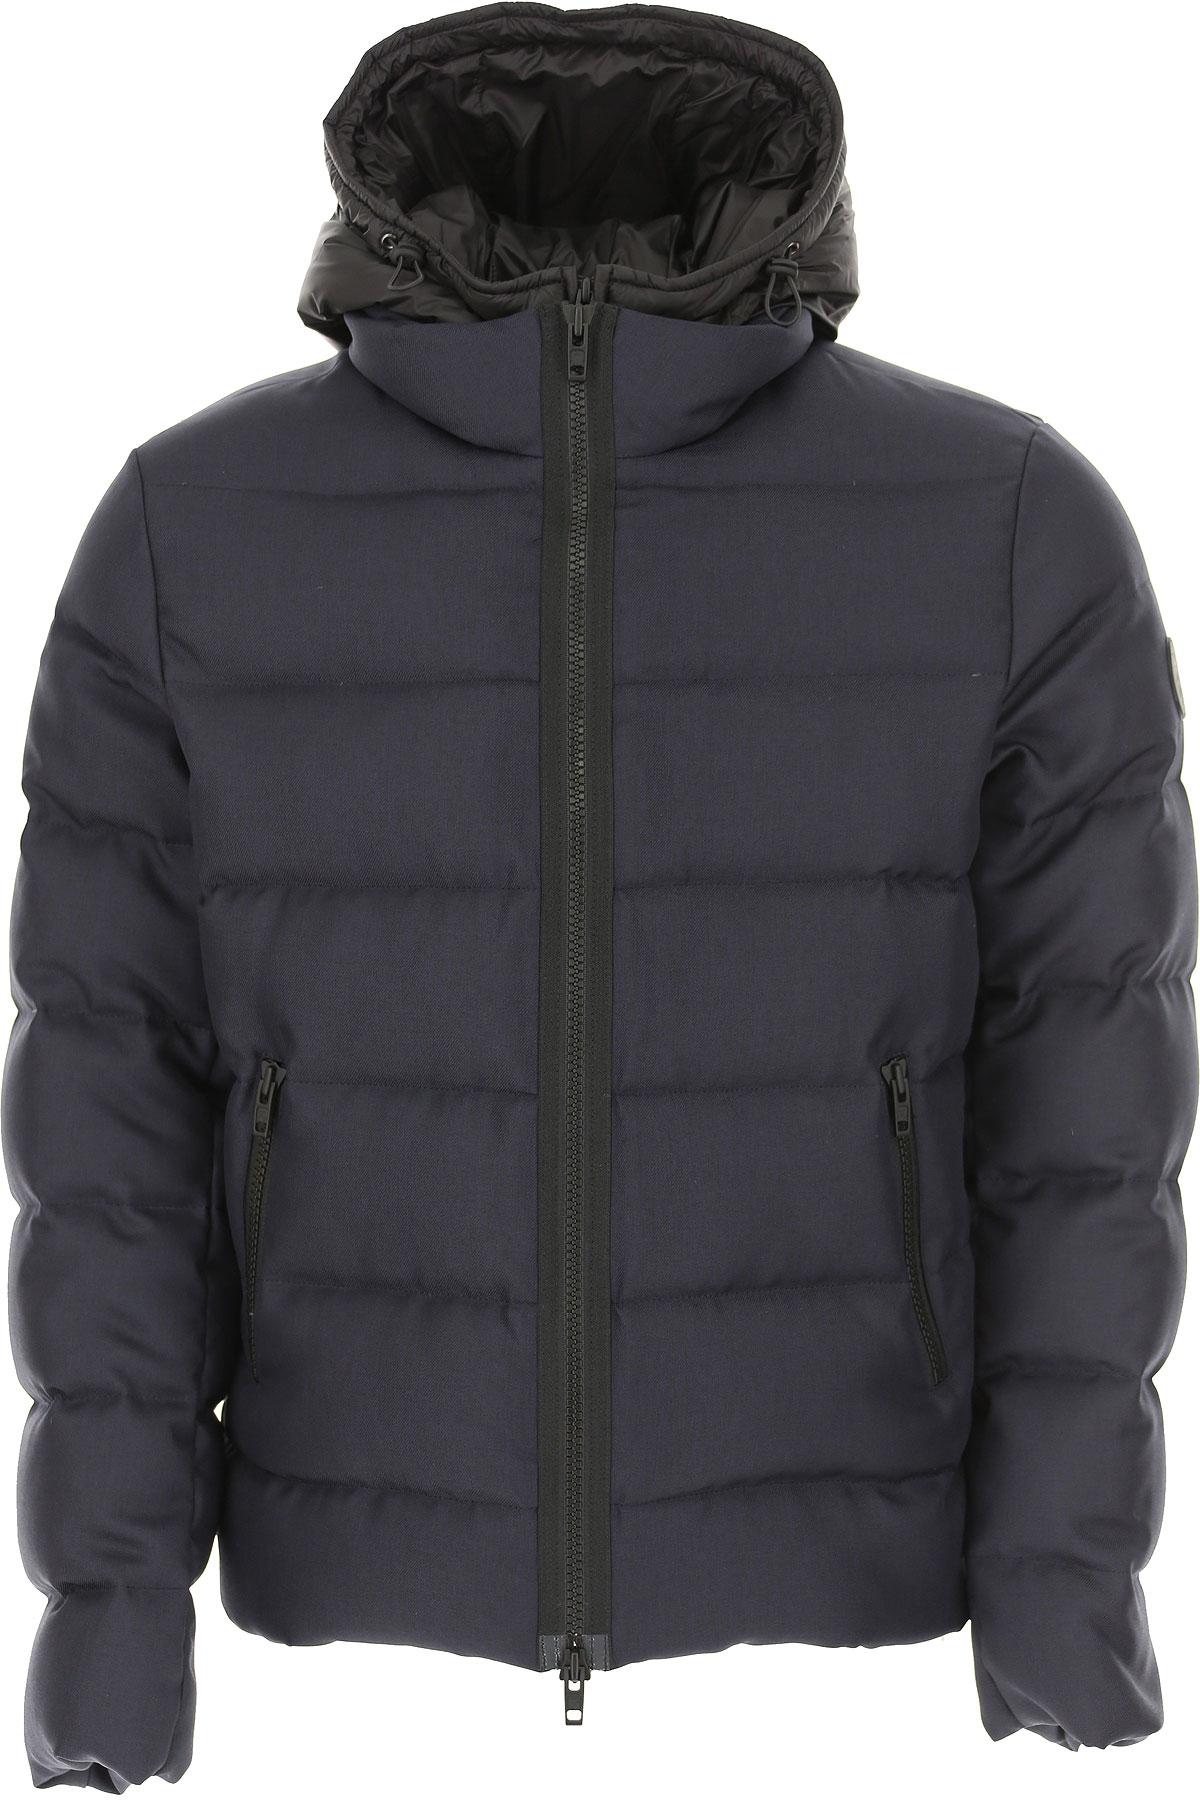 Fay Down Jacket for Men, Puffer Ski Jacket, Blue Ink, polyamide, 2019, L M XL XXL XXXL